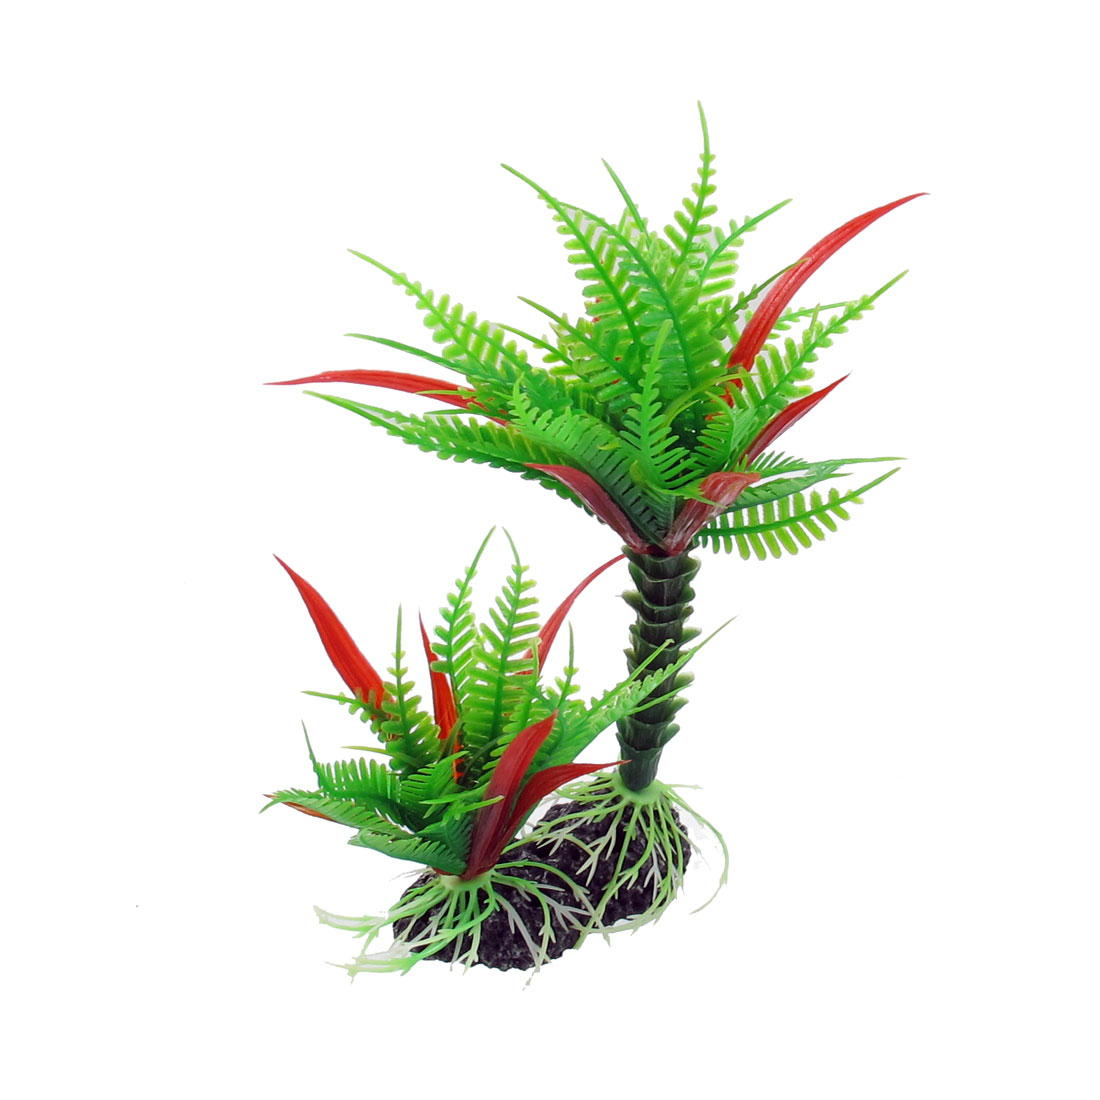 "7.5"" Haut Vert Rouge Plante Plastique Aquarium - image 1 de 1"